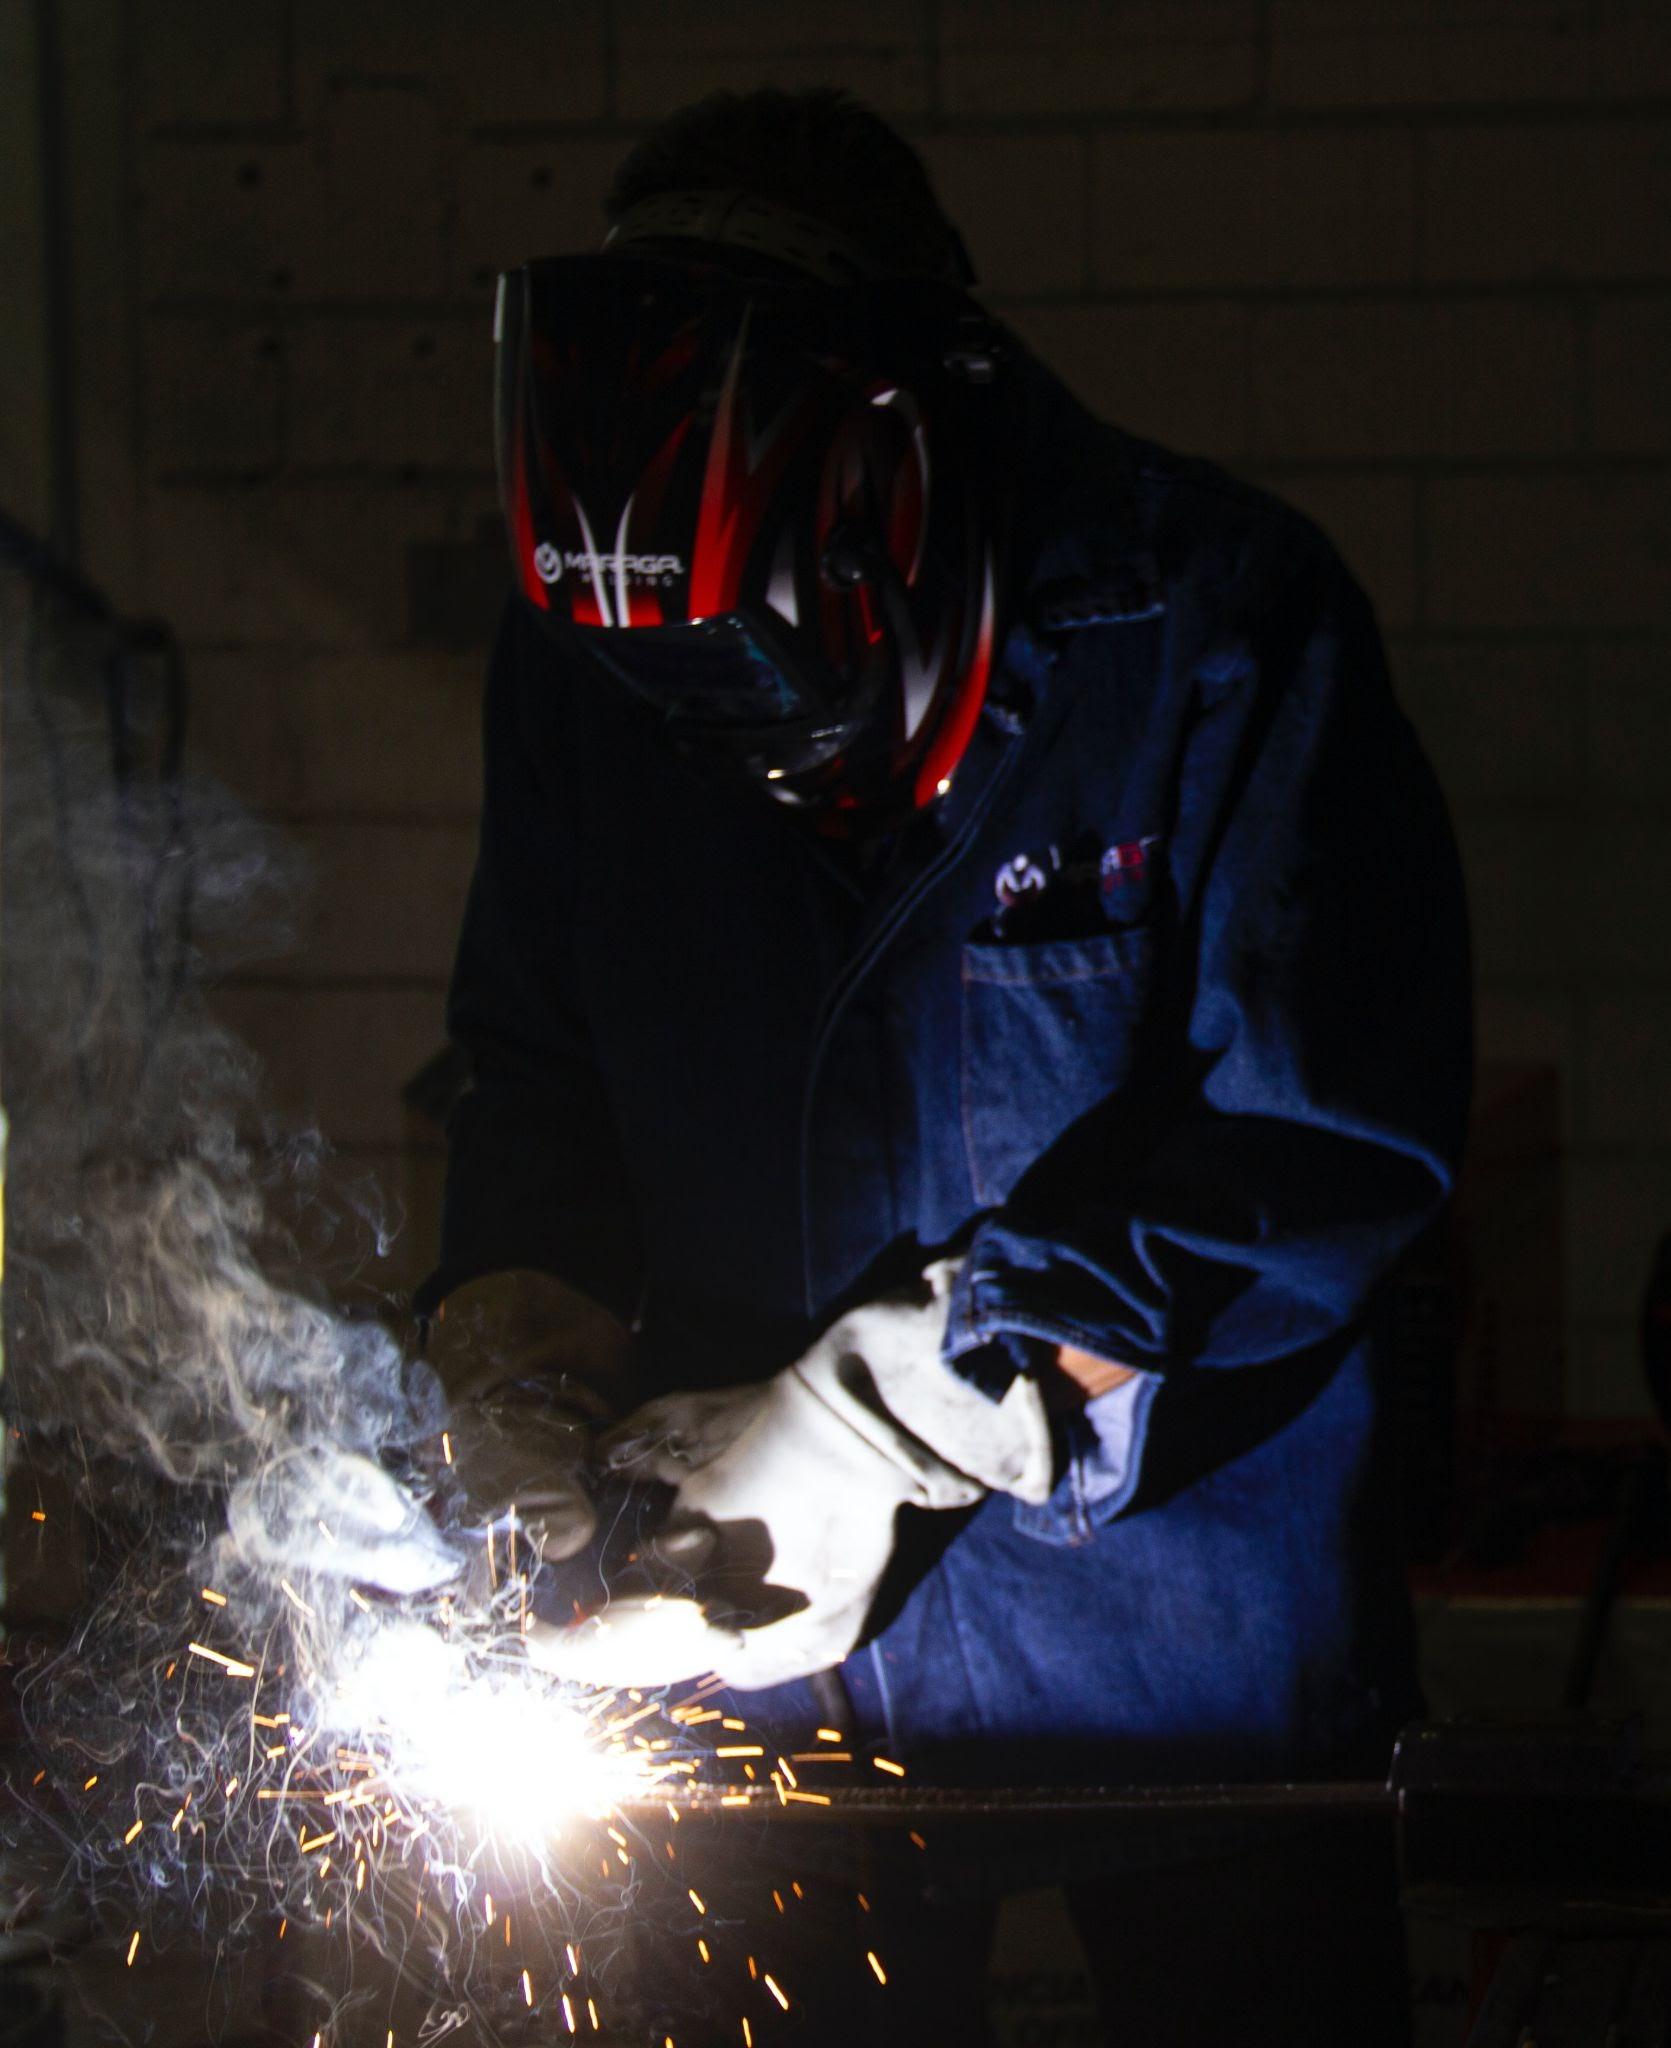 man using fabrication tool